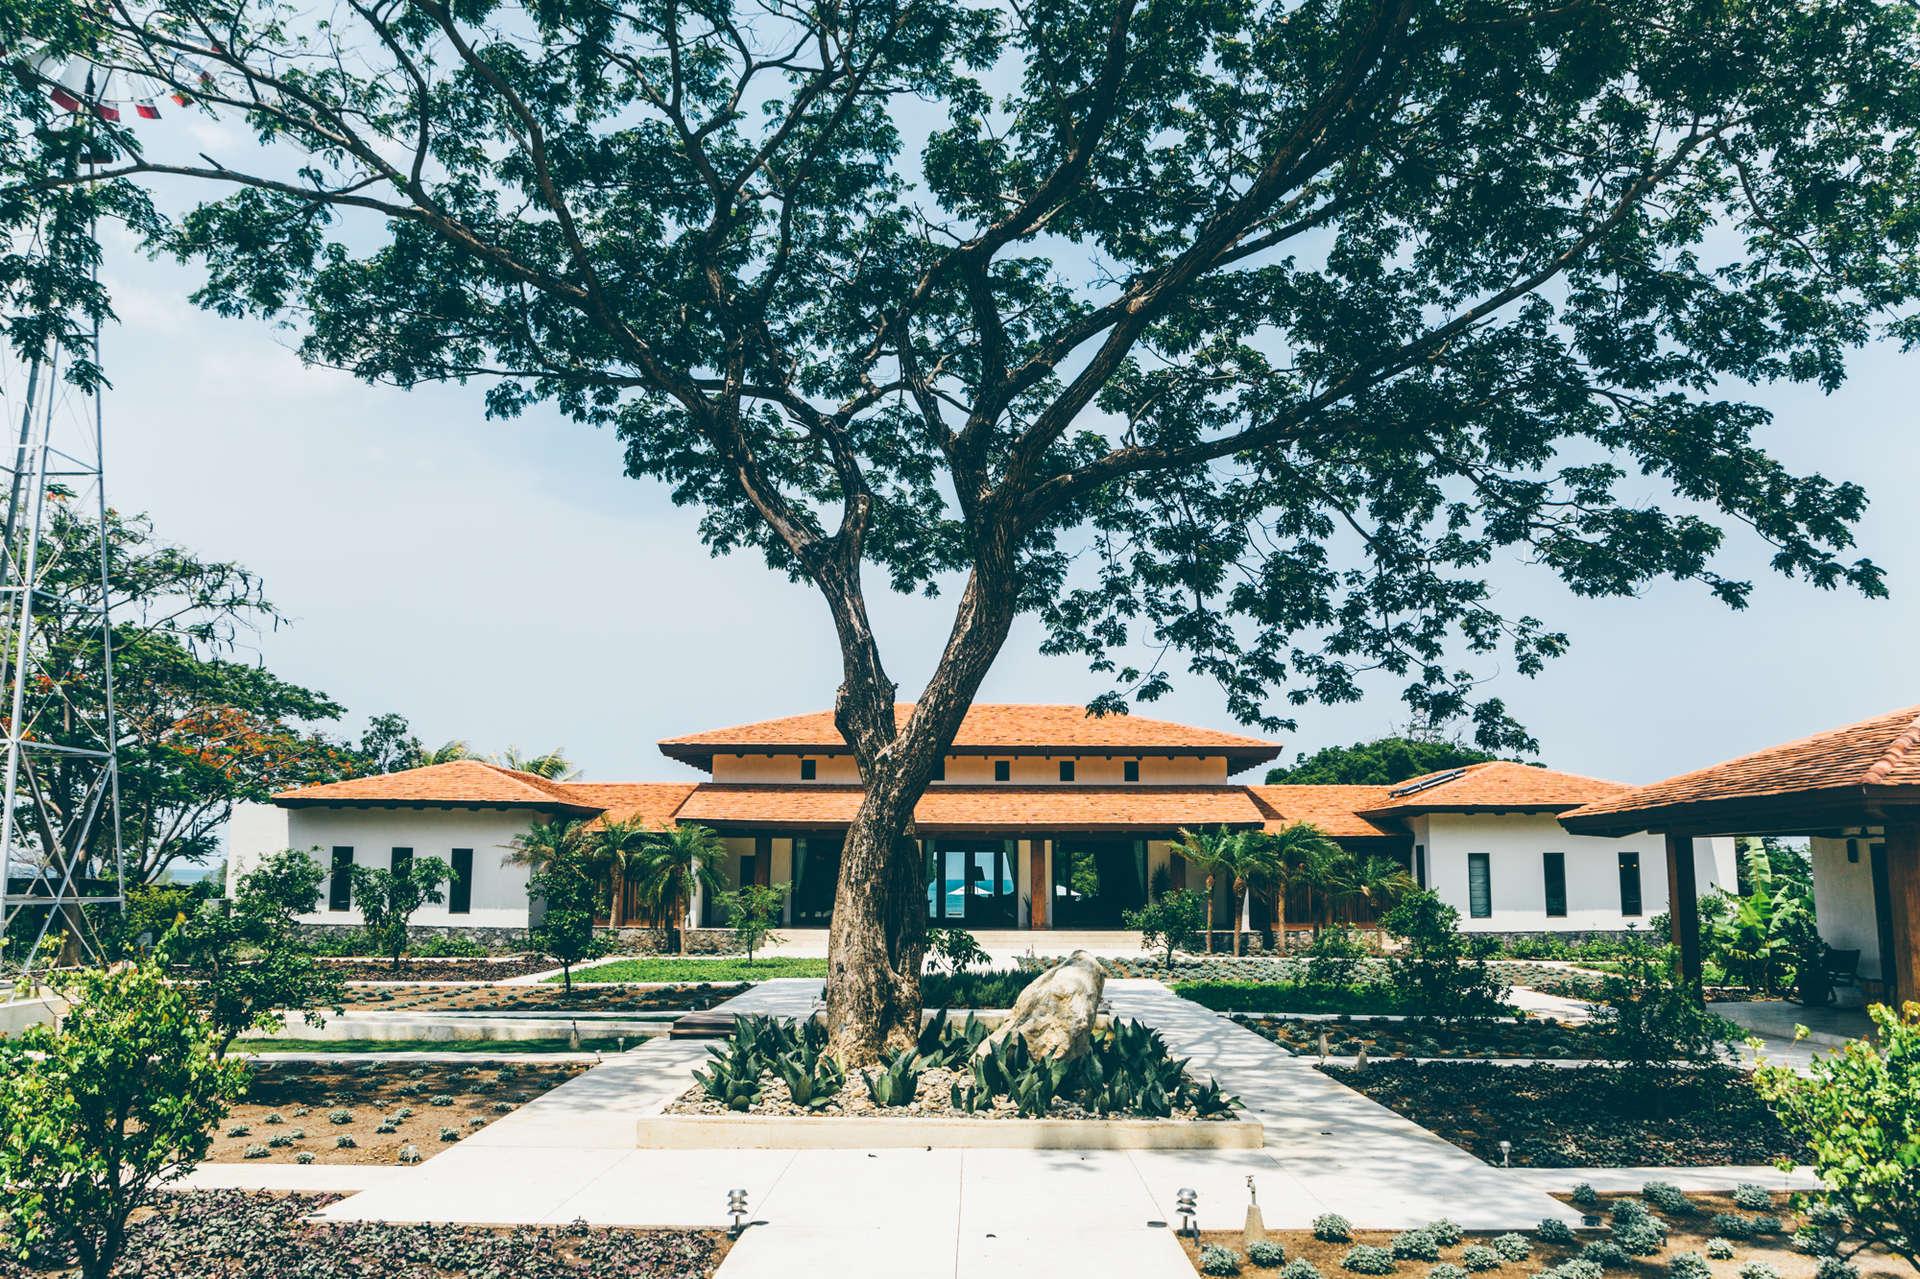 Central america villa rentals - Nicaragua - Rivas  manzanillo - No location 4 - Casa Madera - Image 1/22